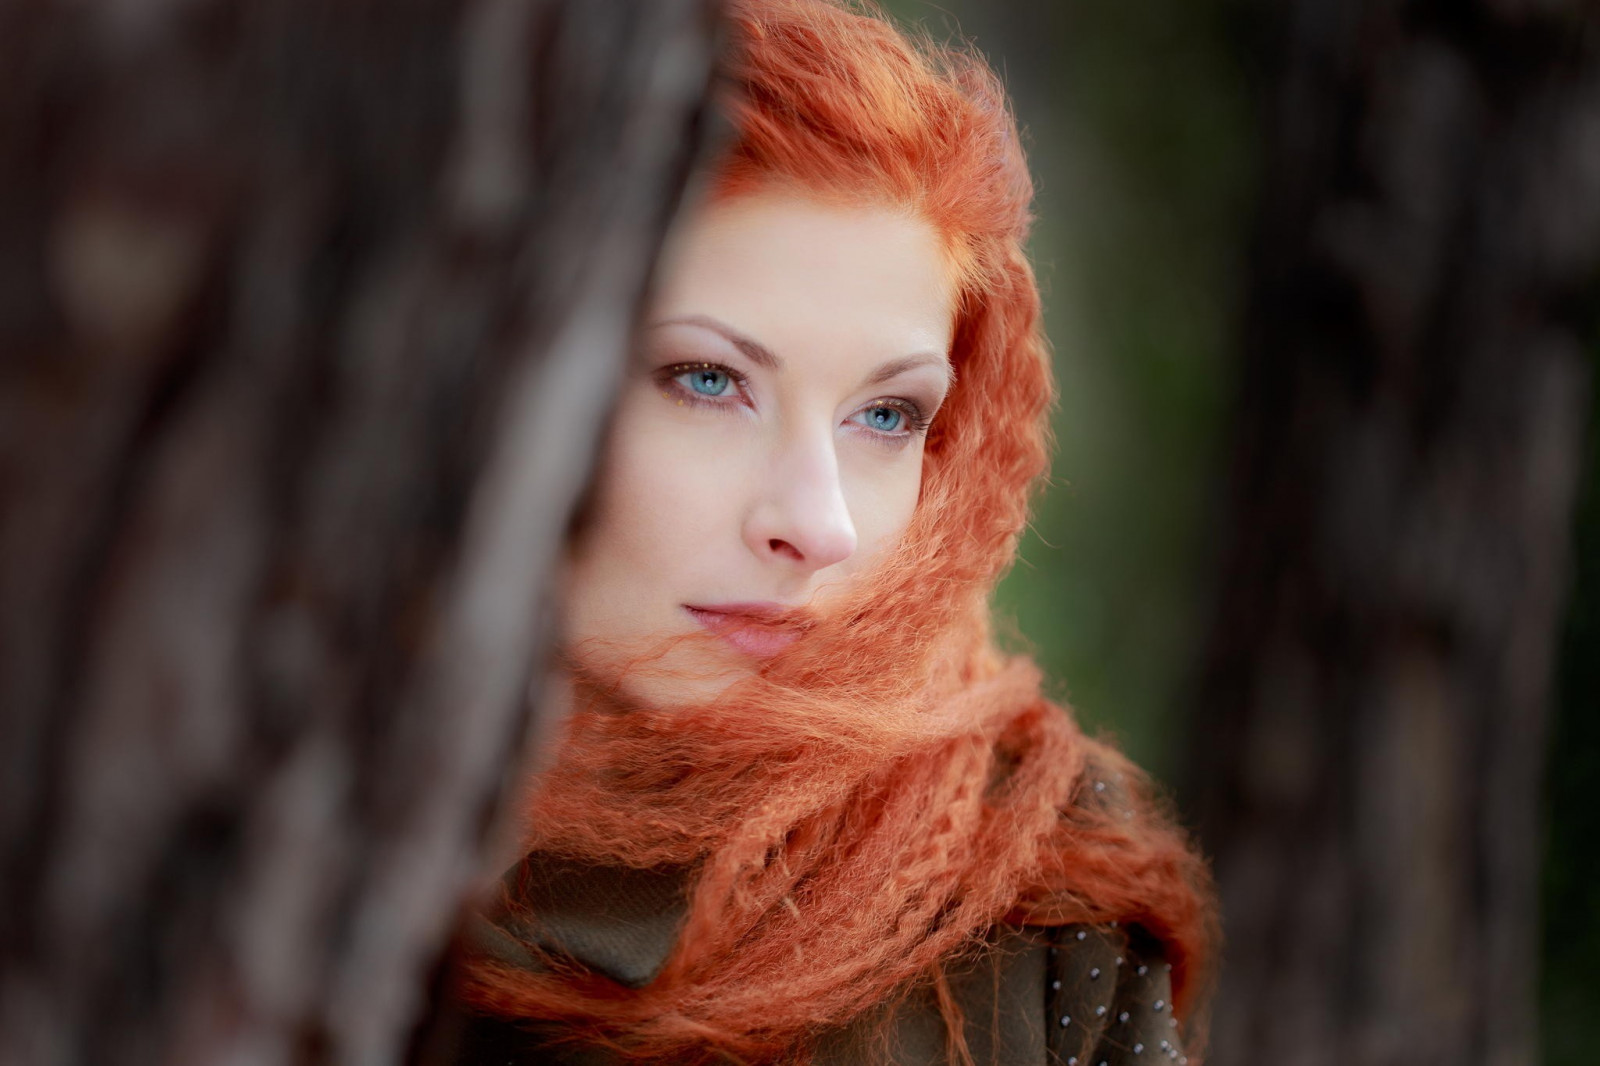 Cute Long Hair Girl Wallpaper Wallpaper Face Women Outdoors Redhead Model Depth Of